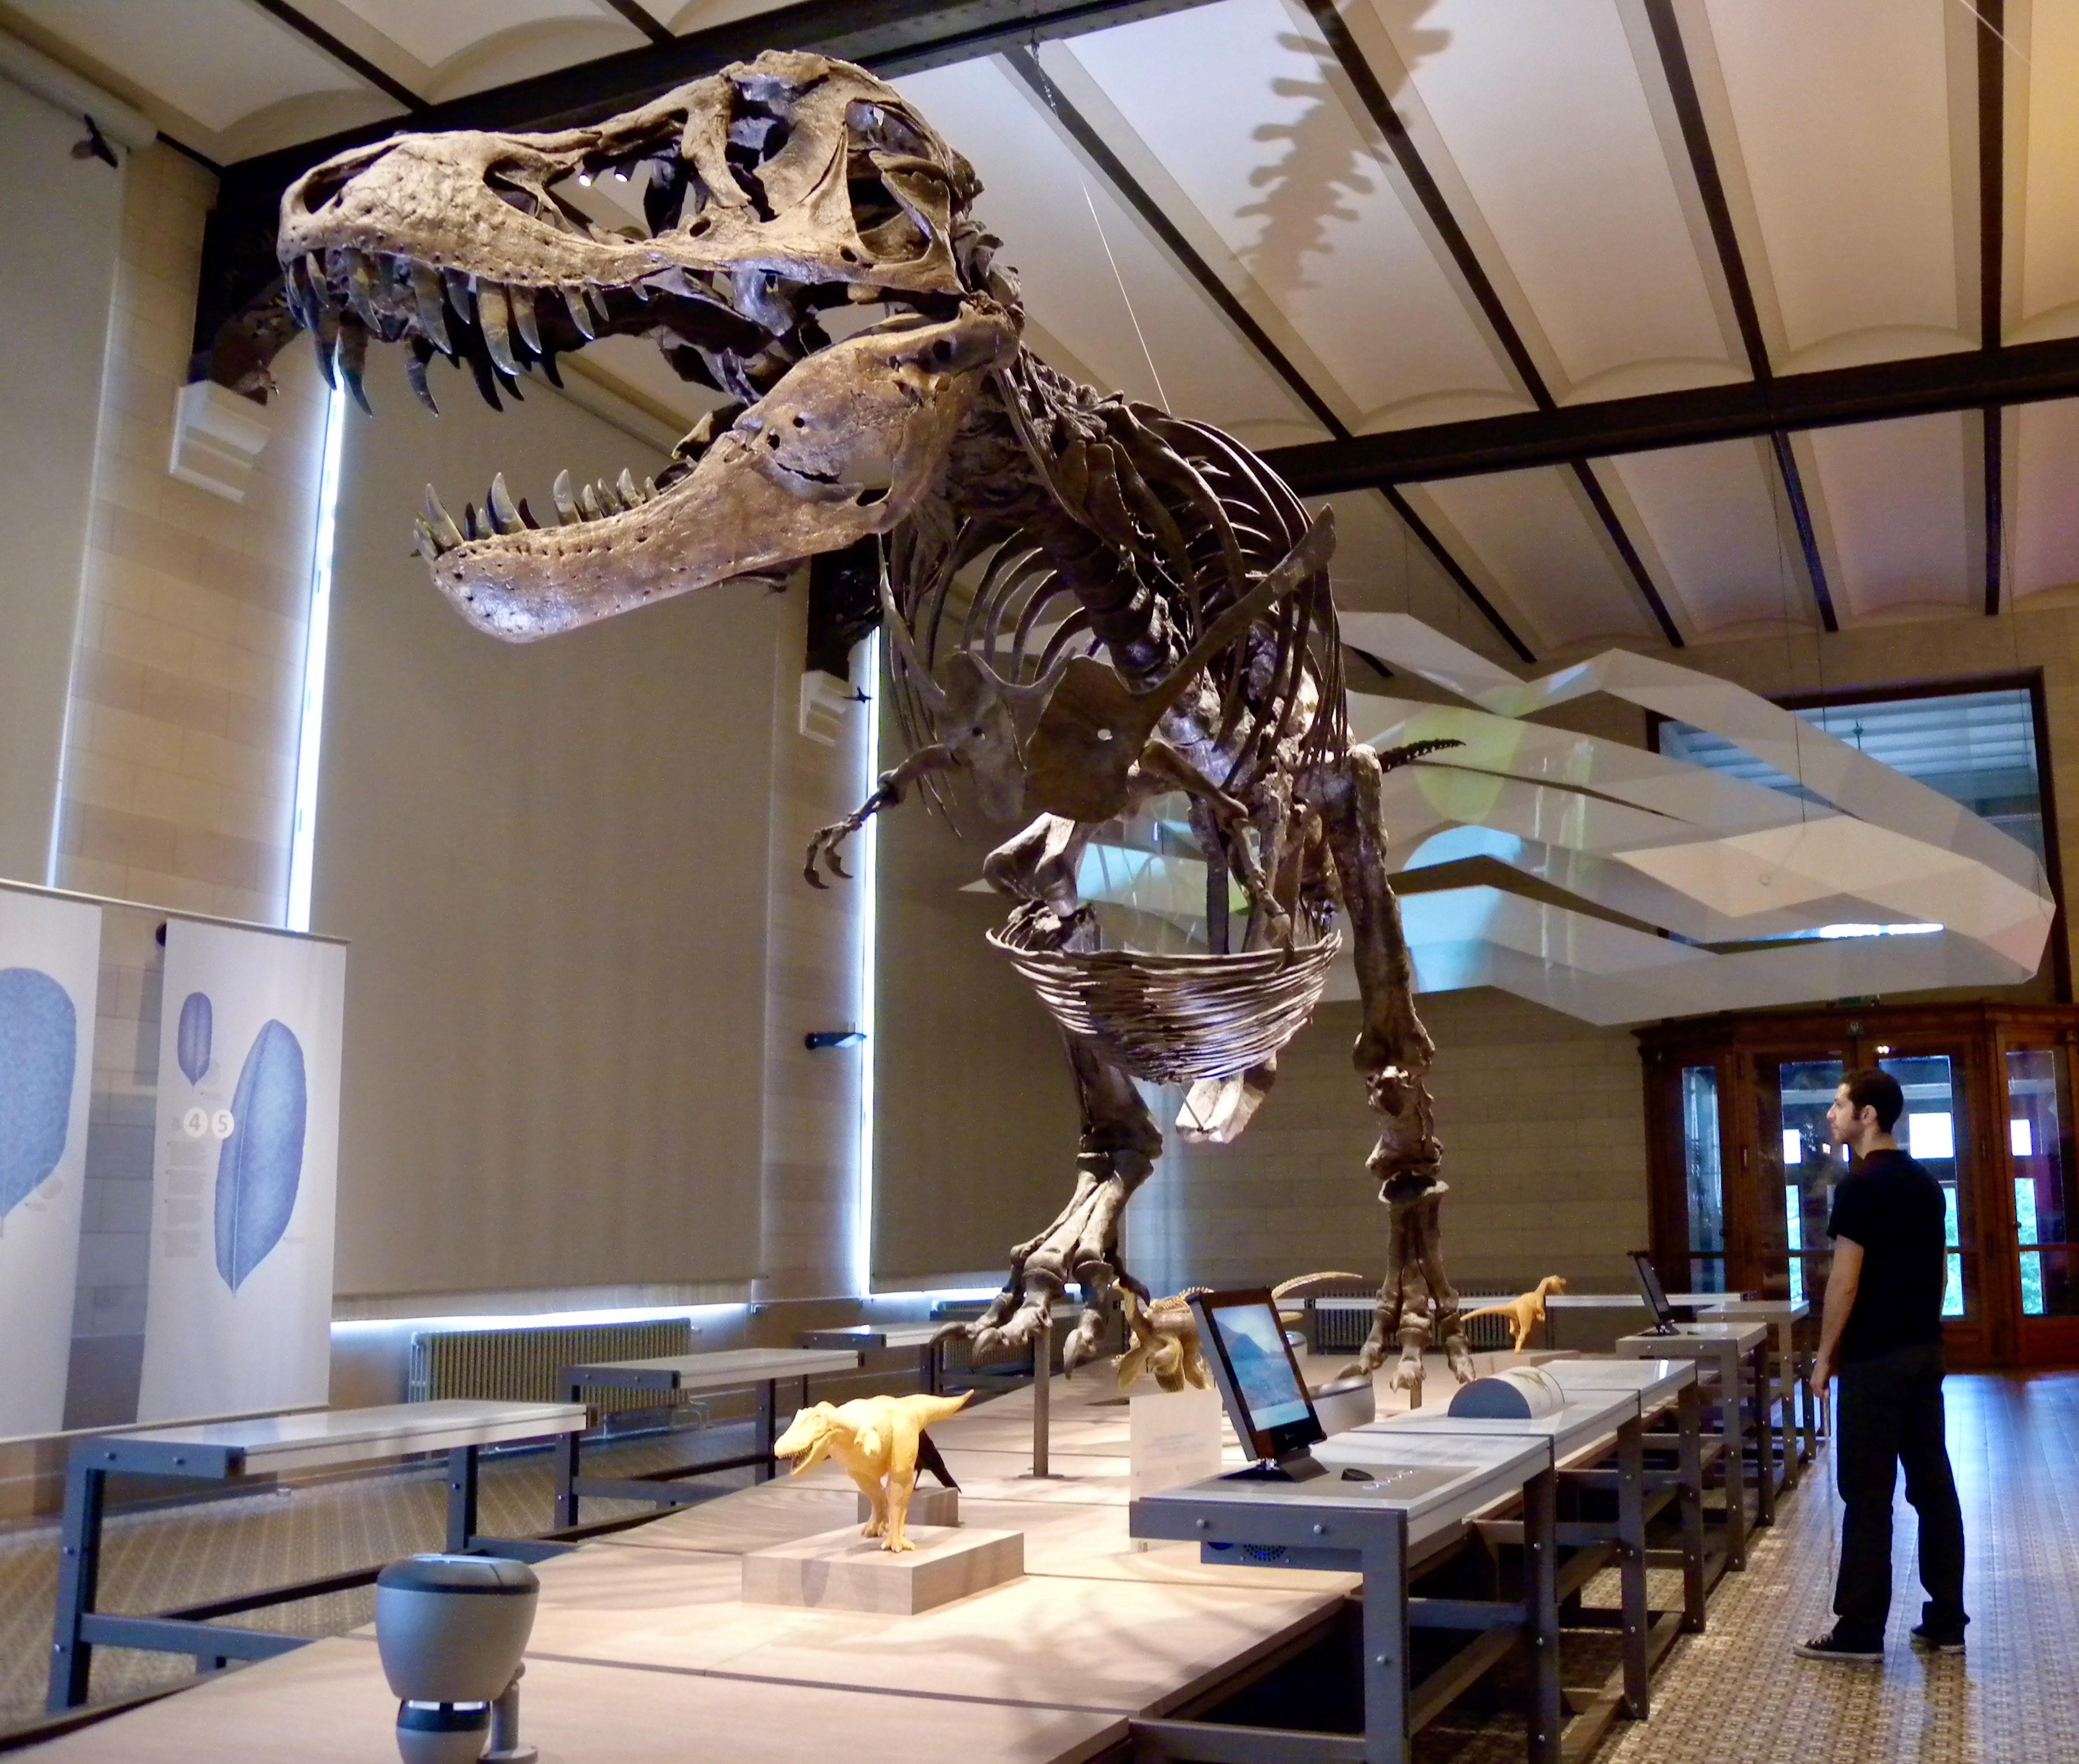 Dr Campione with Tyrannosaurus rex